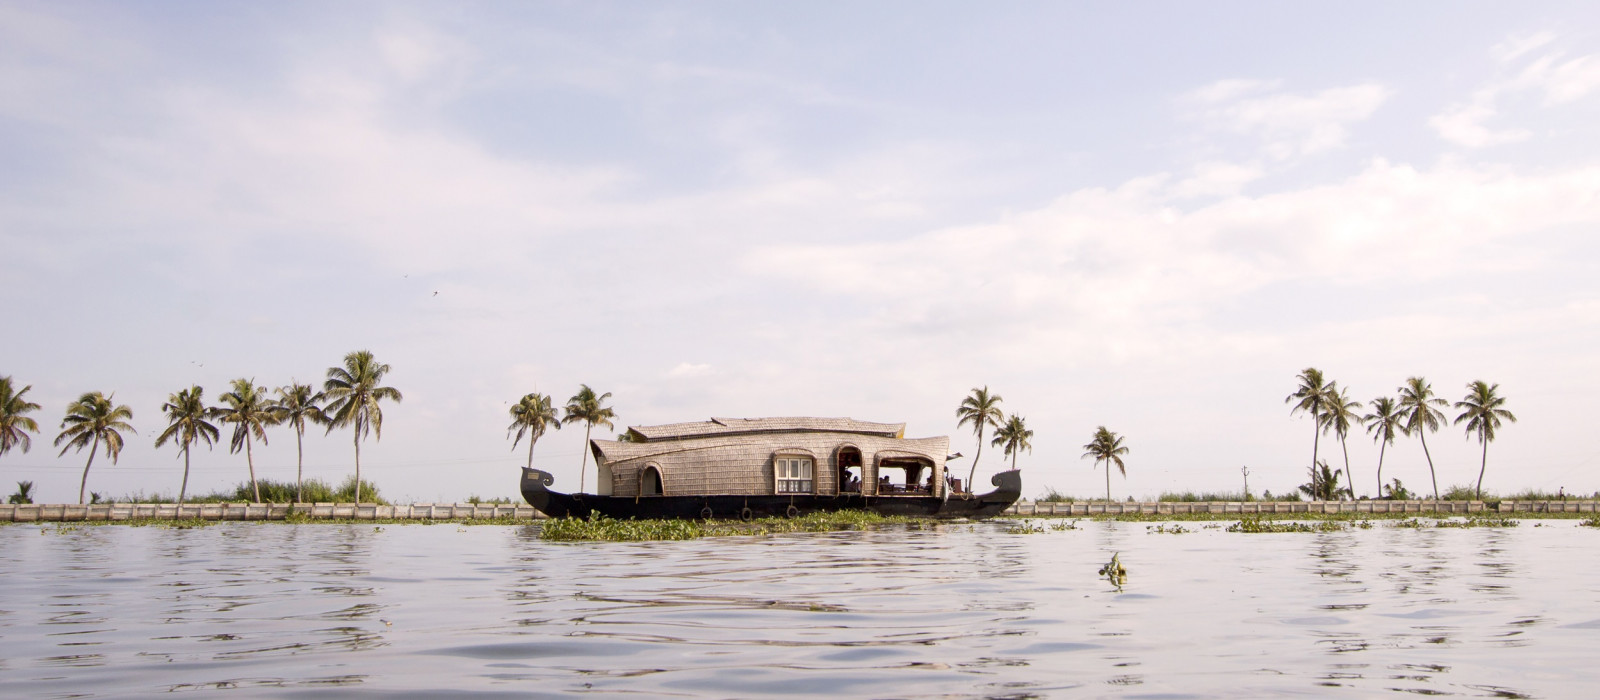 Magisches Indien: Goldenes Dreieck, Königstiger & Kerala Backwaters Urlaub 1